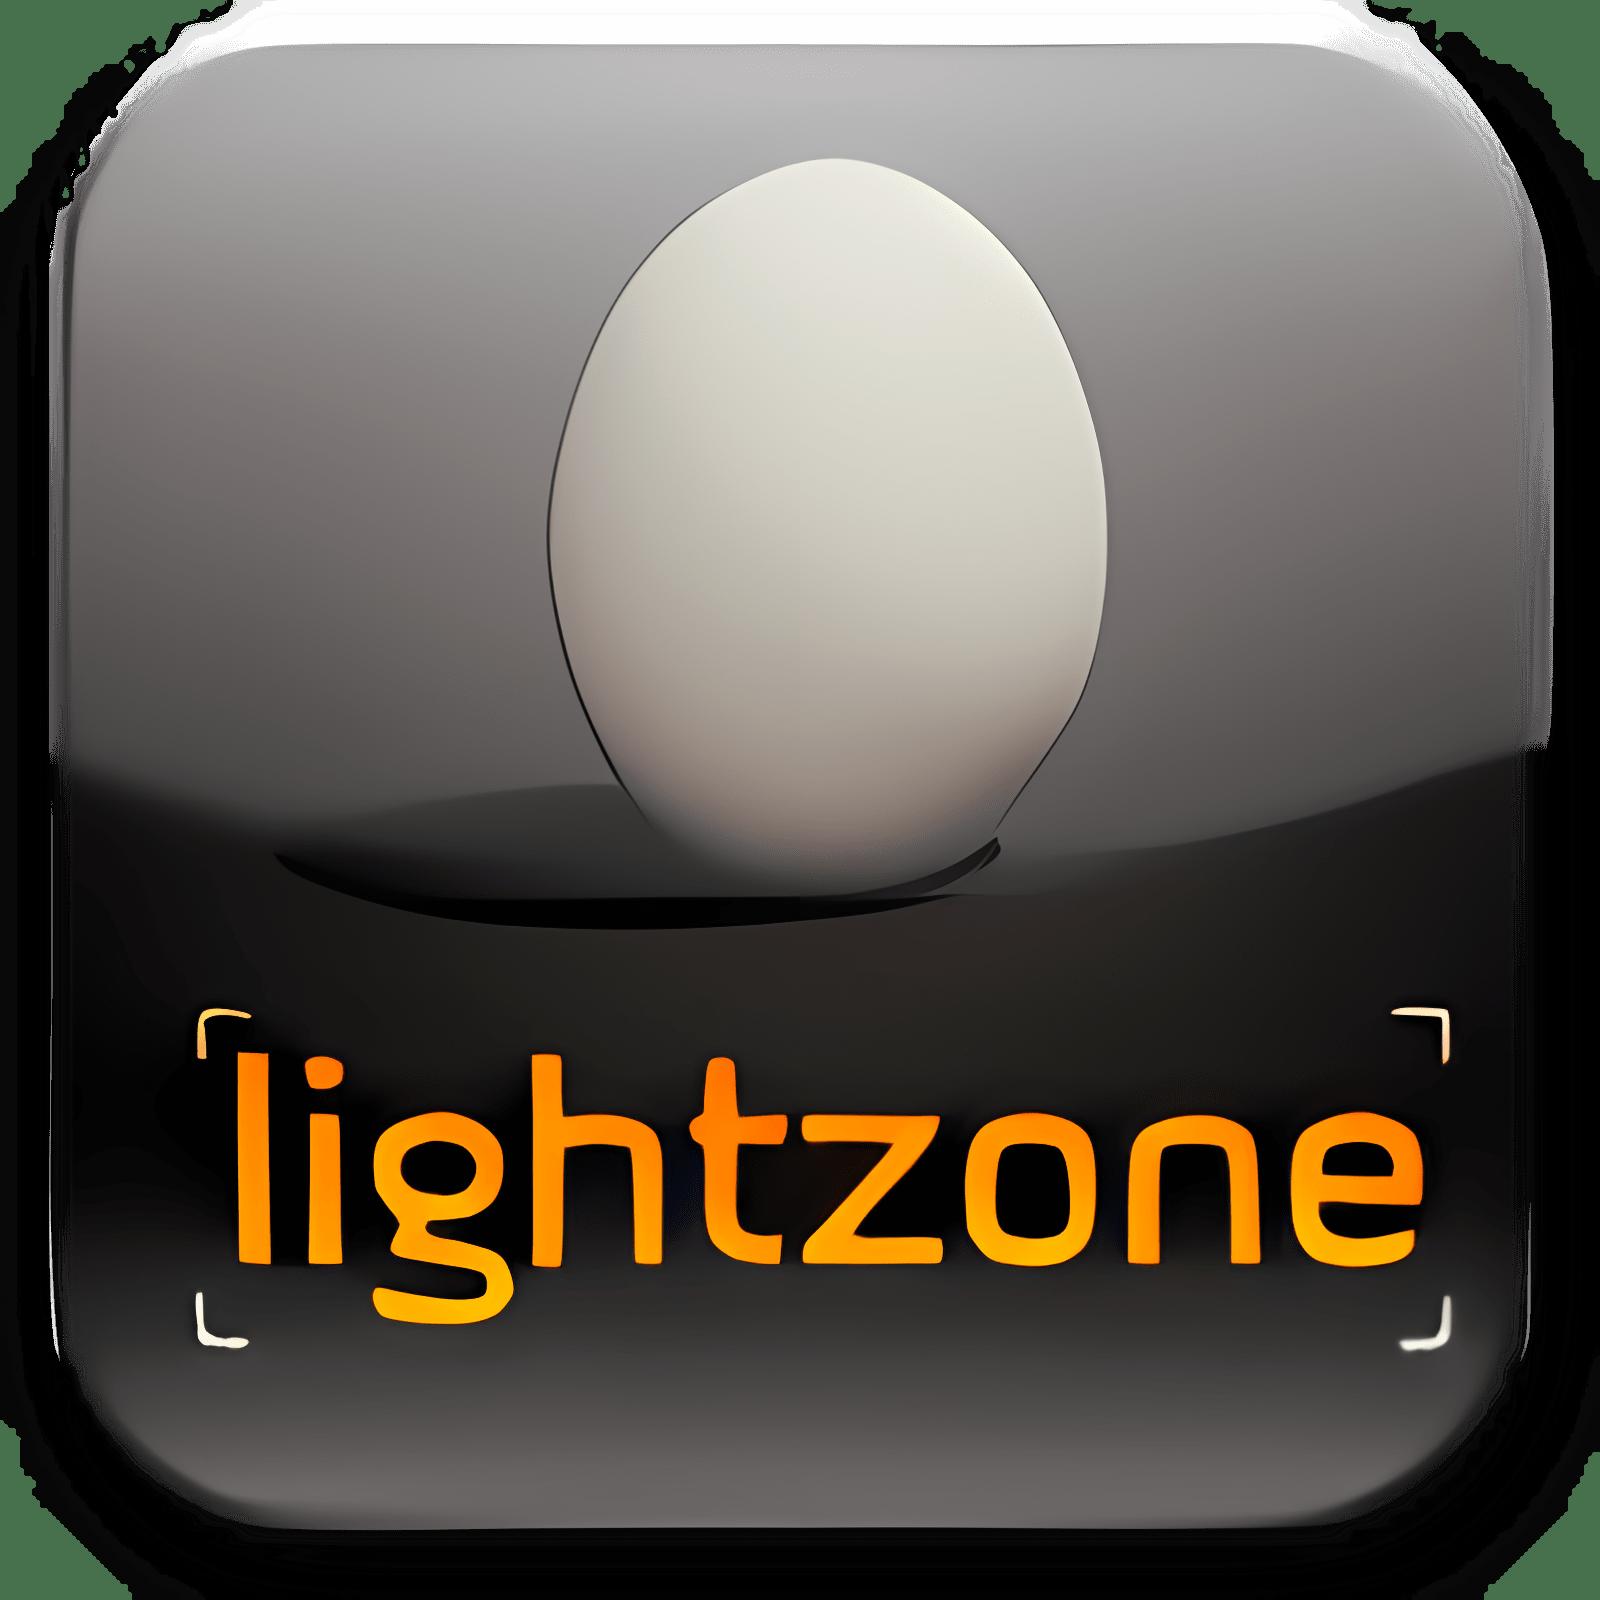 LightZone 3.9